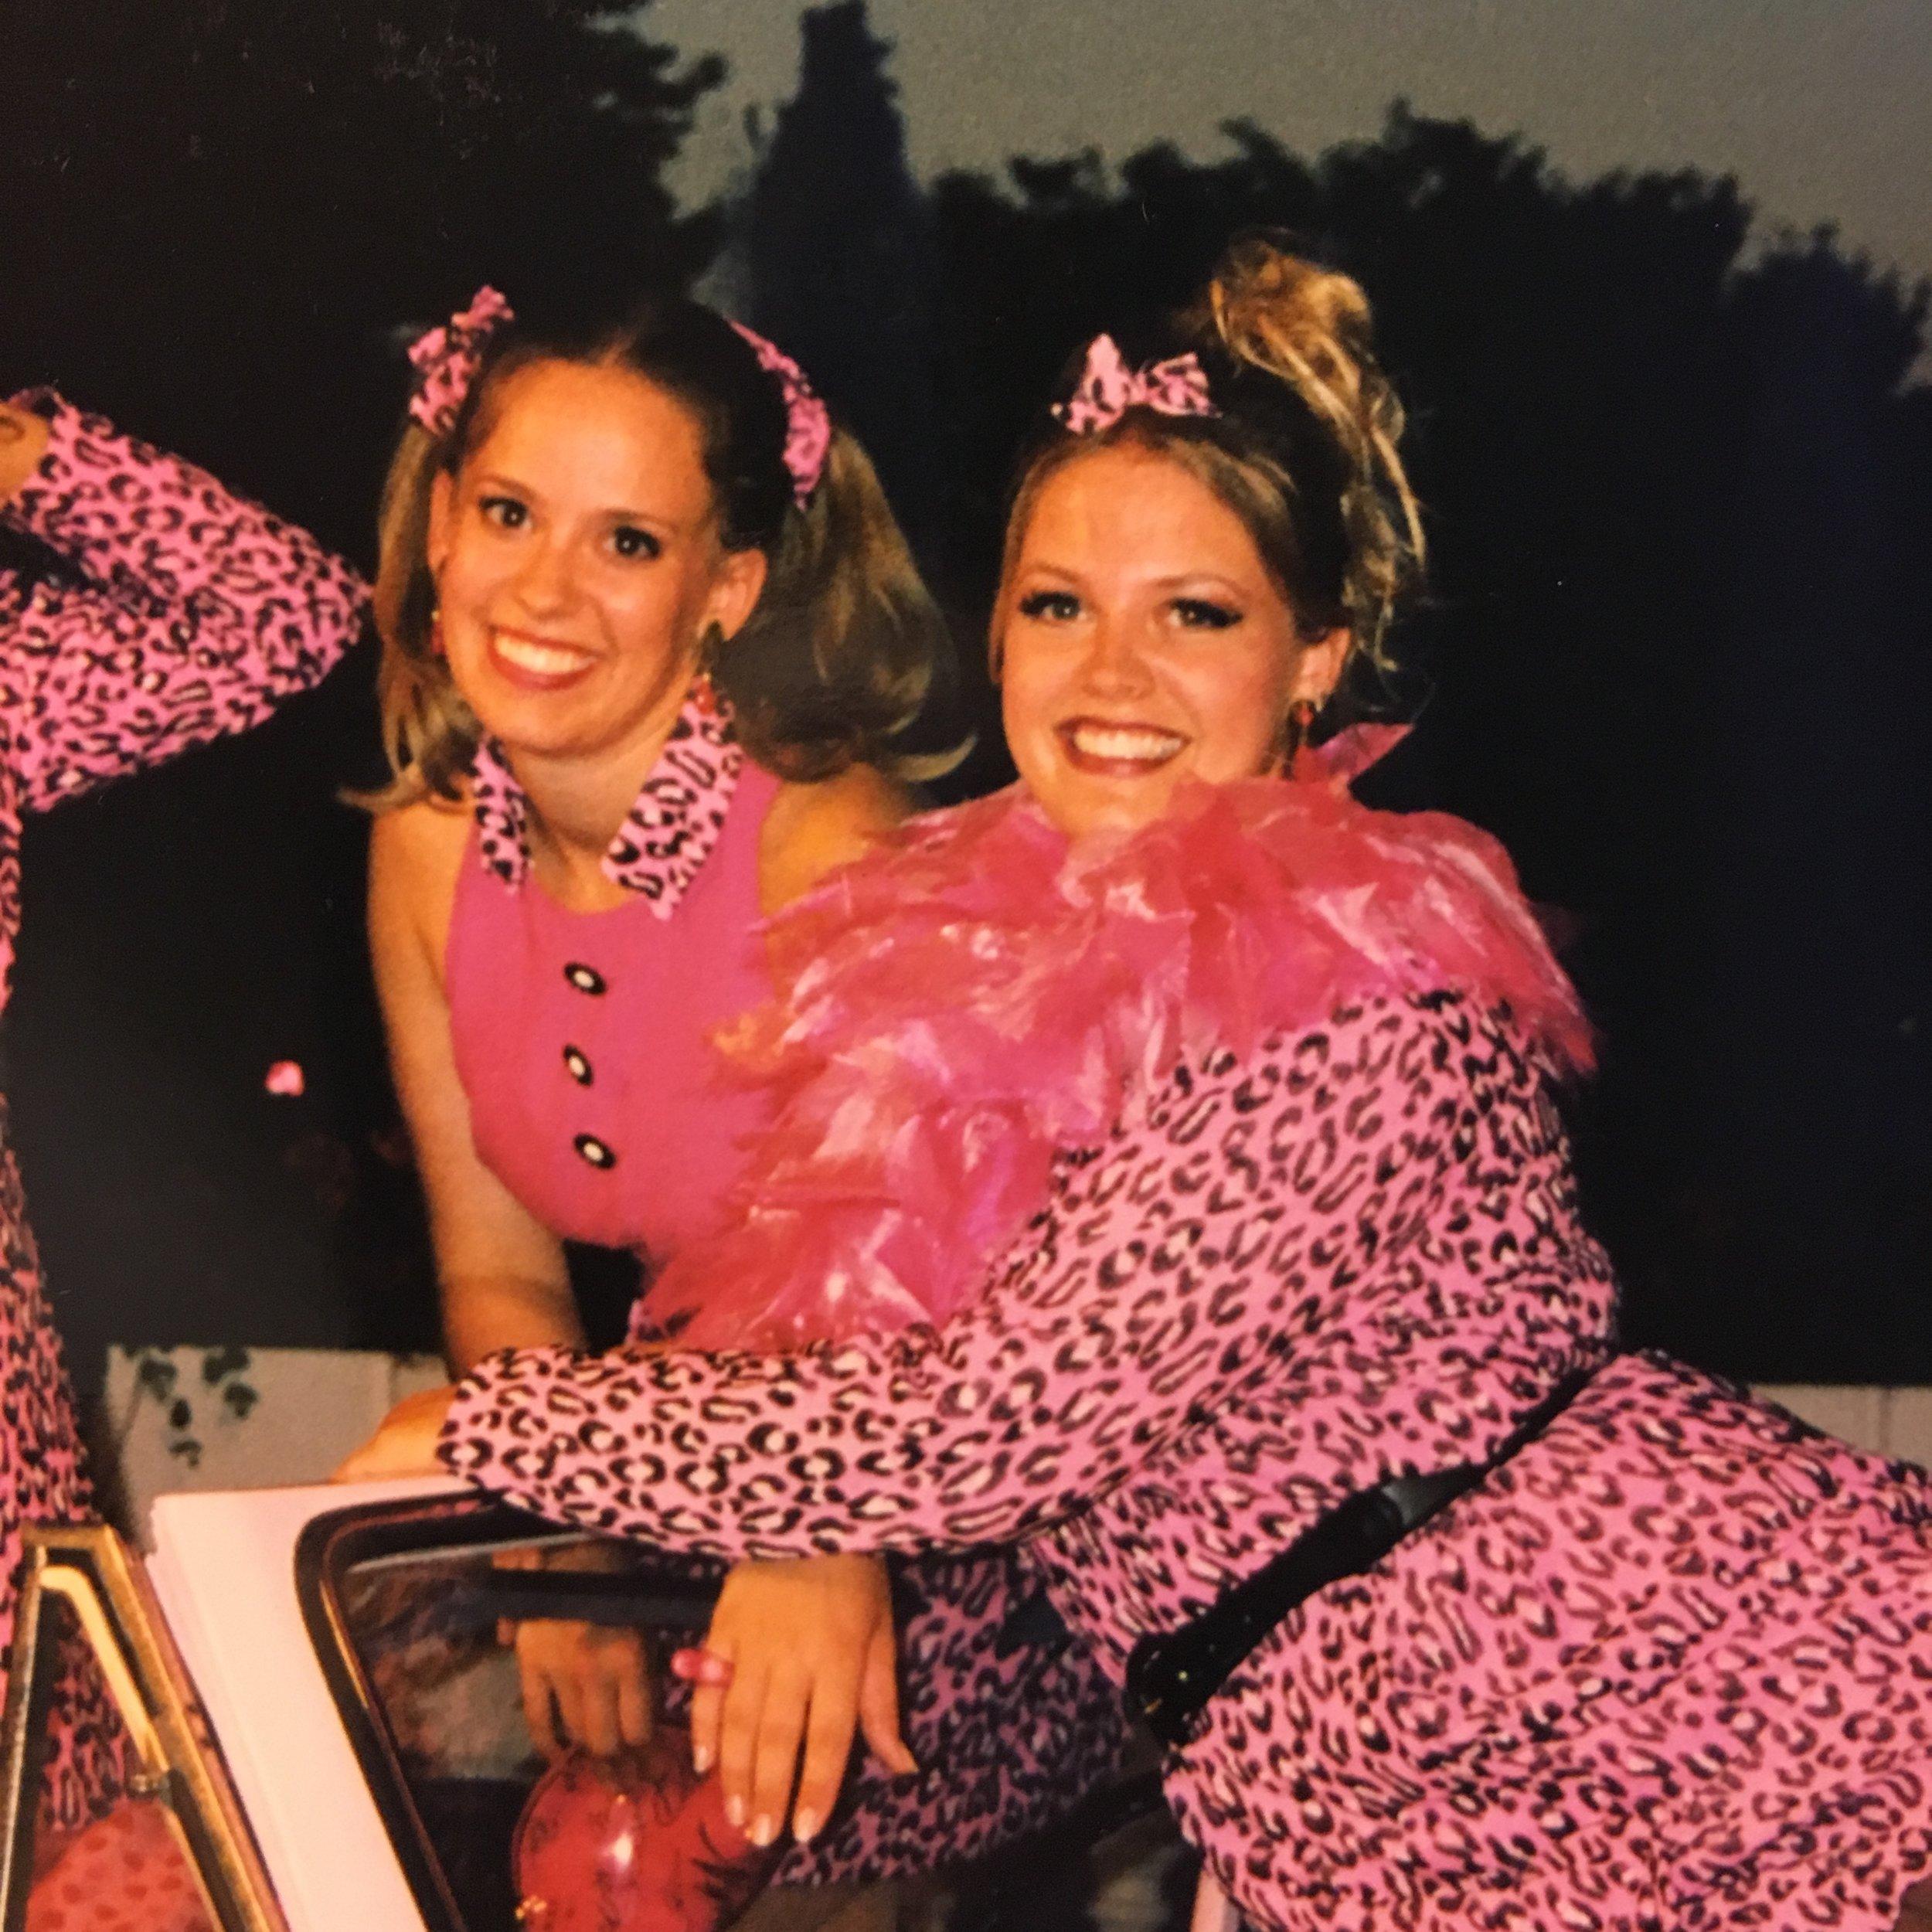 Rachel Hoffman working during college in the summer of 1998, with Elizabeth Stanley.